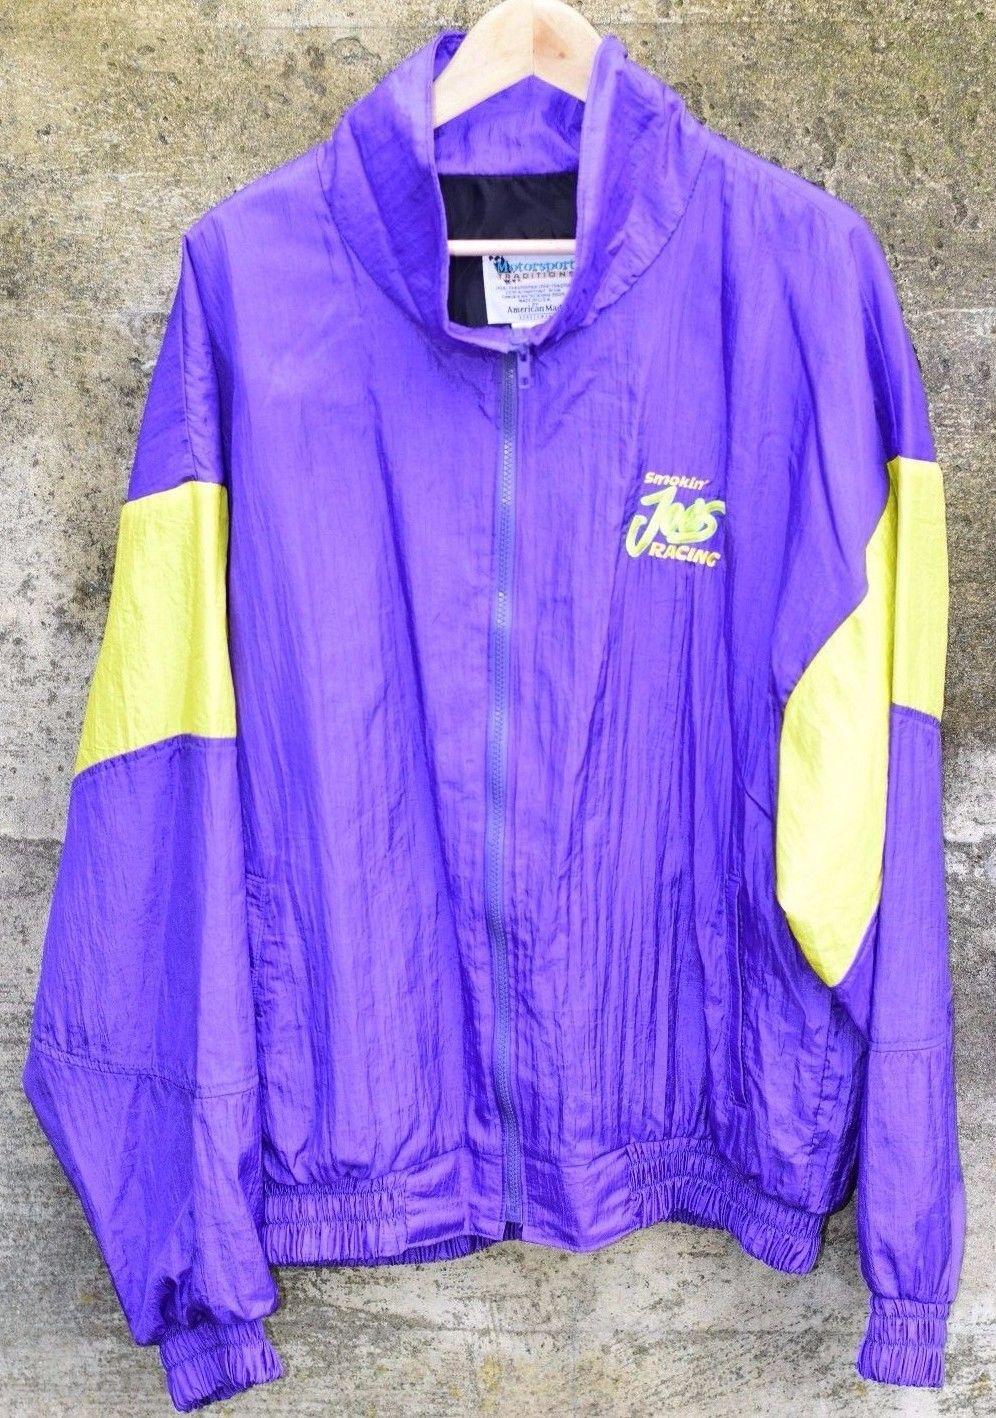 Smokin Joe Camel Racing Jacket Vintage Windbreaker 90s Mens XL Rare Nascar OG